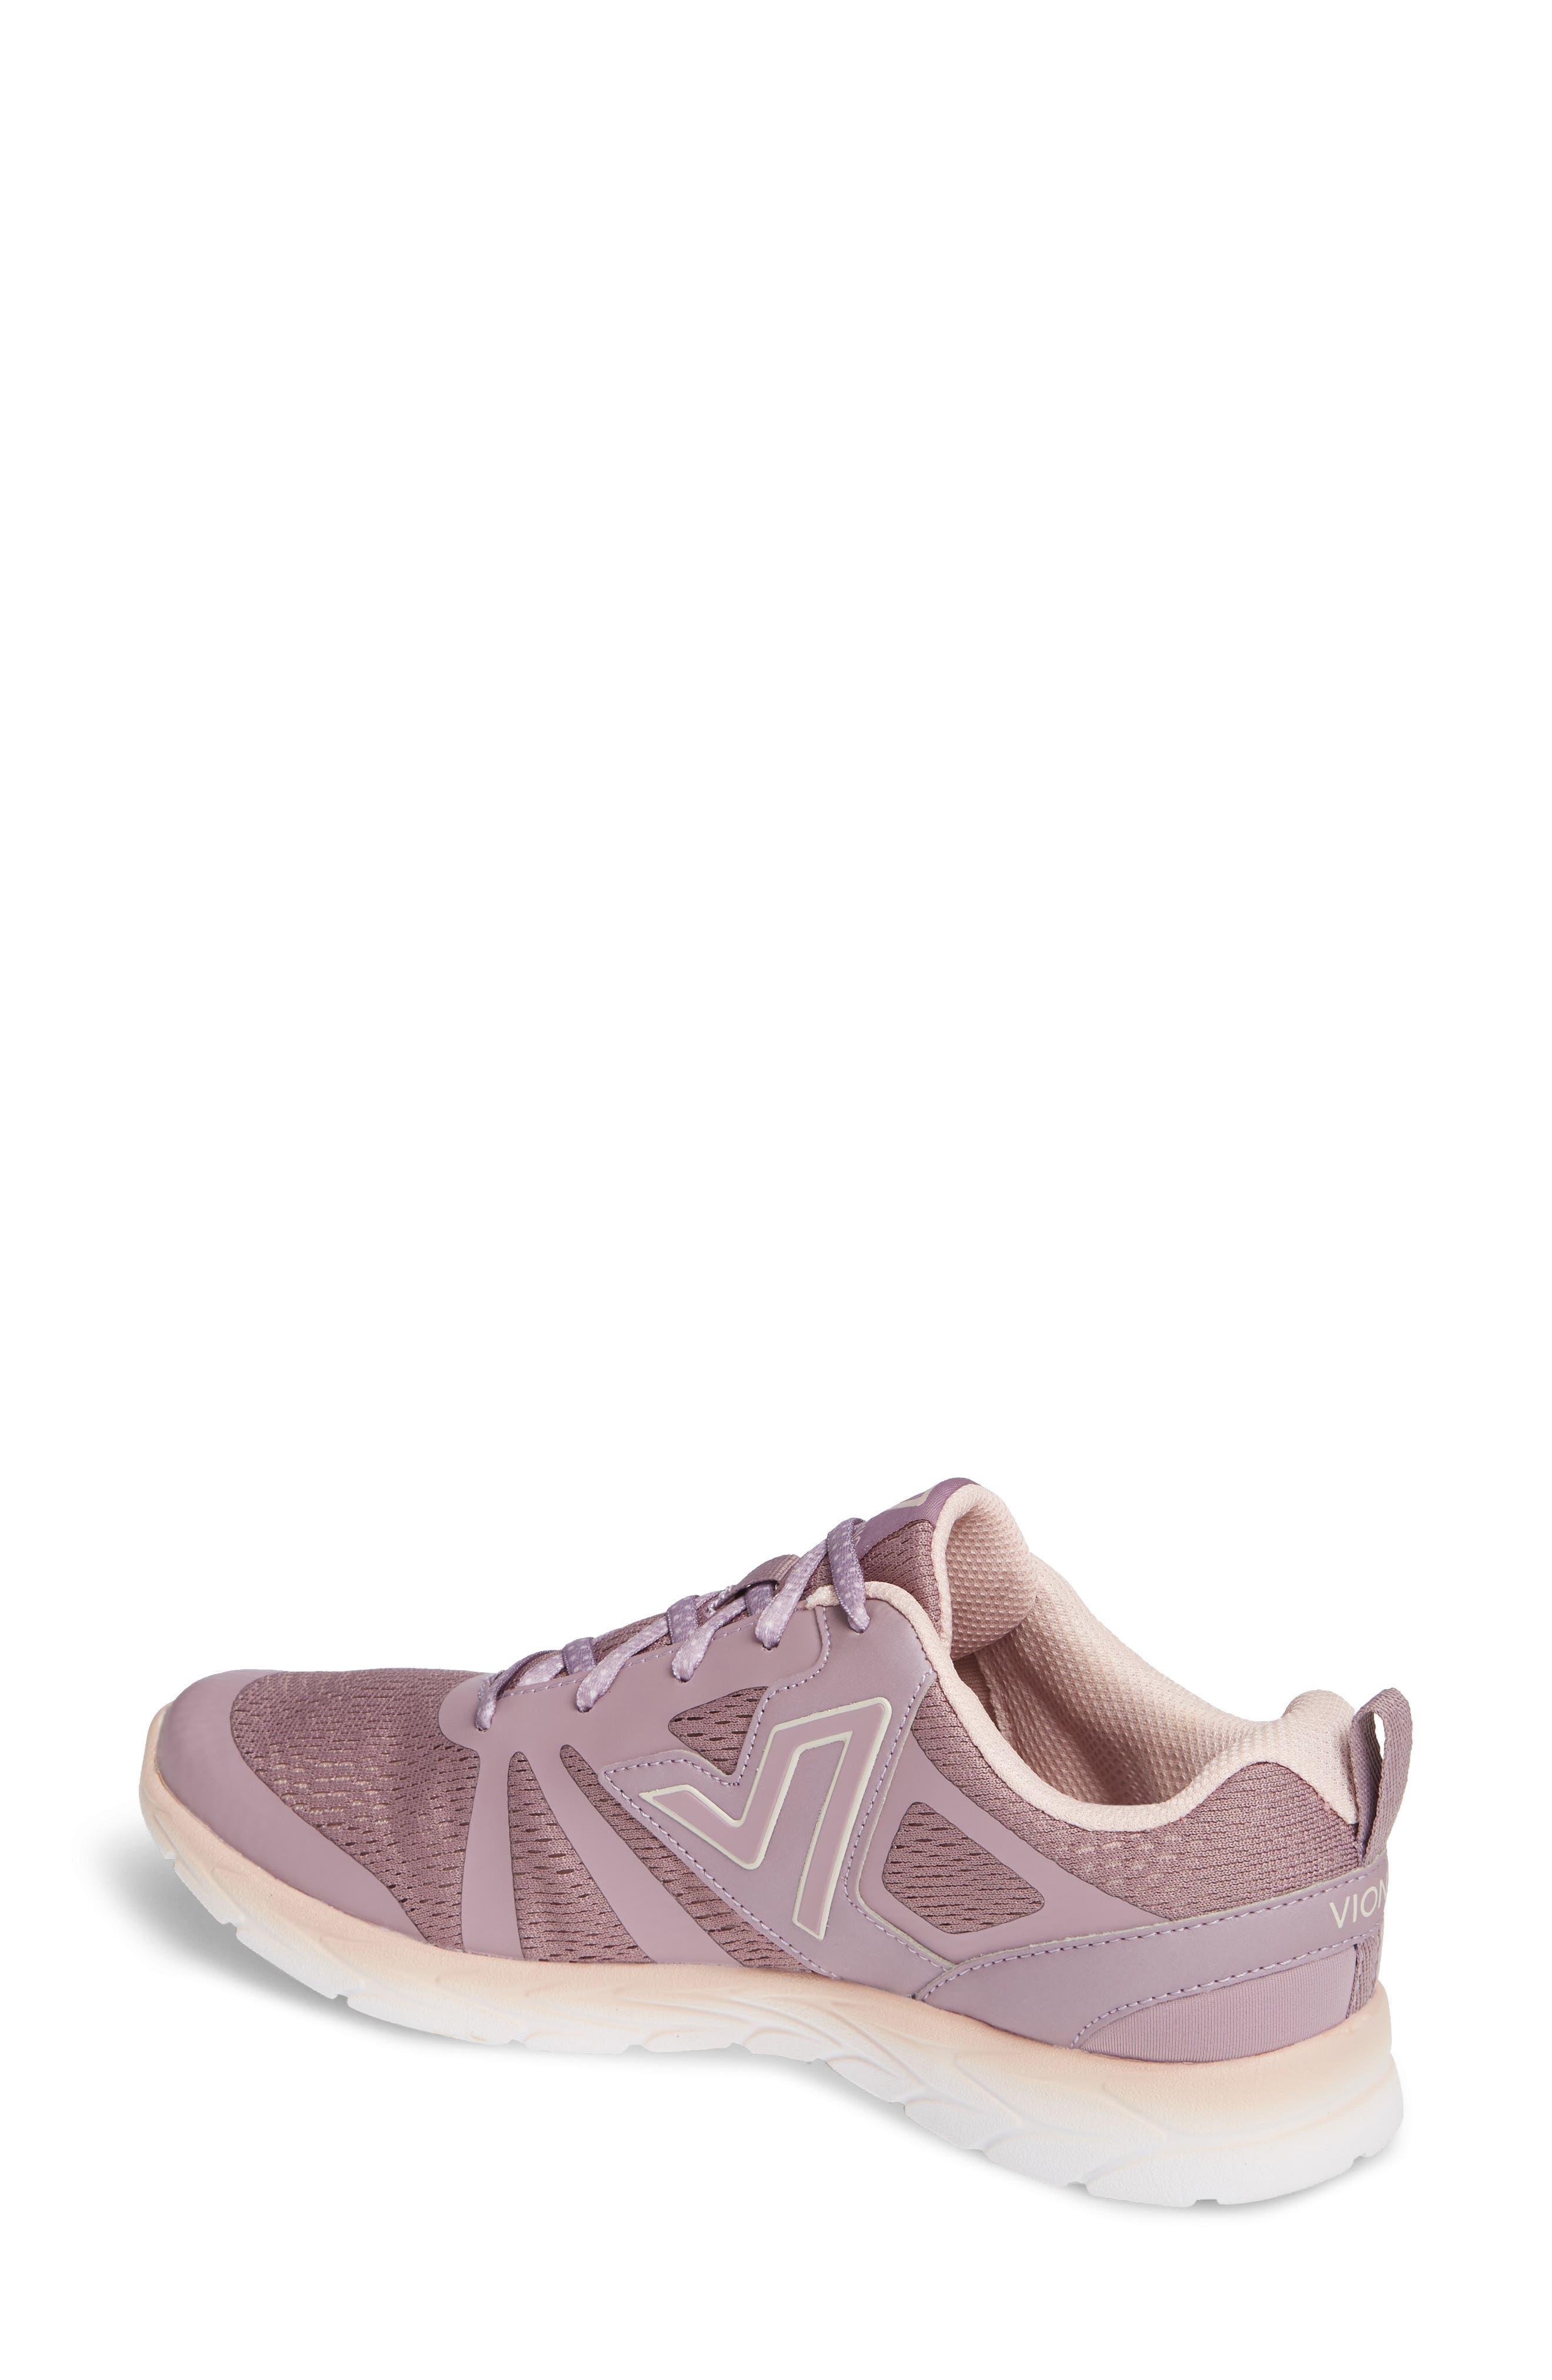 VIONIC,                             Brisk Miles Sneaker,                             Alternate thumbnail 2, color,                             MAUVE